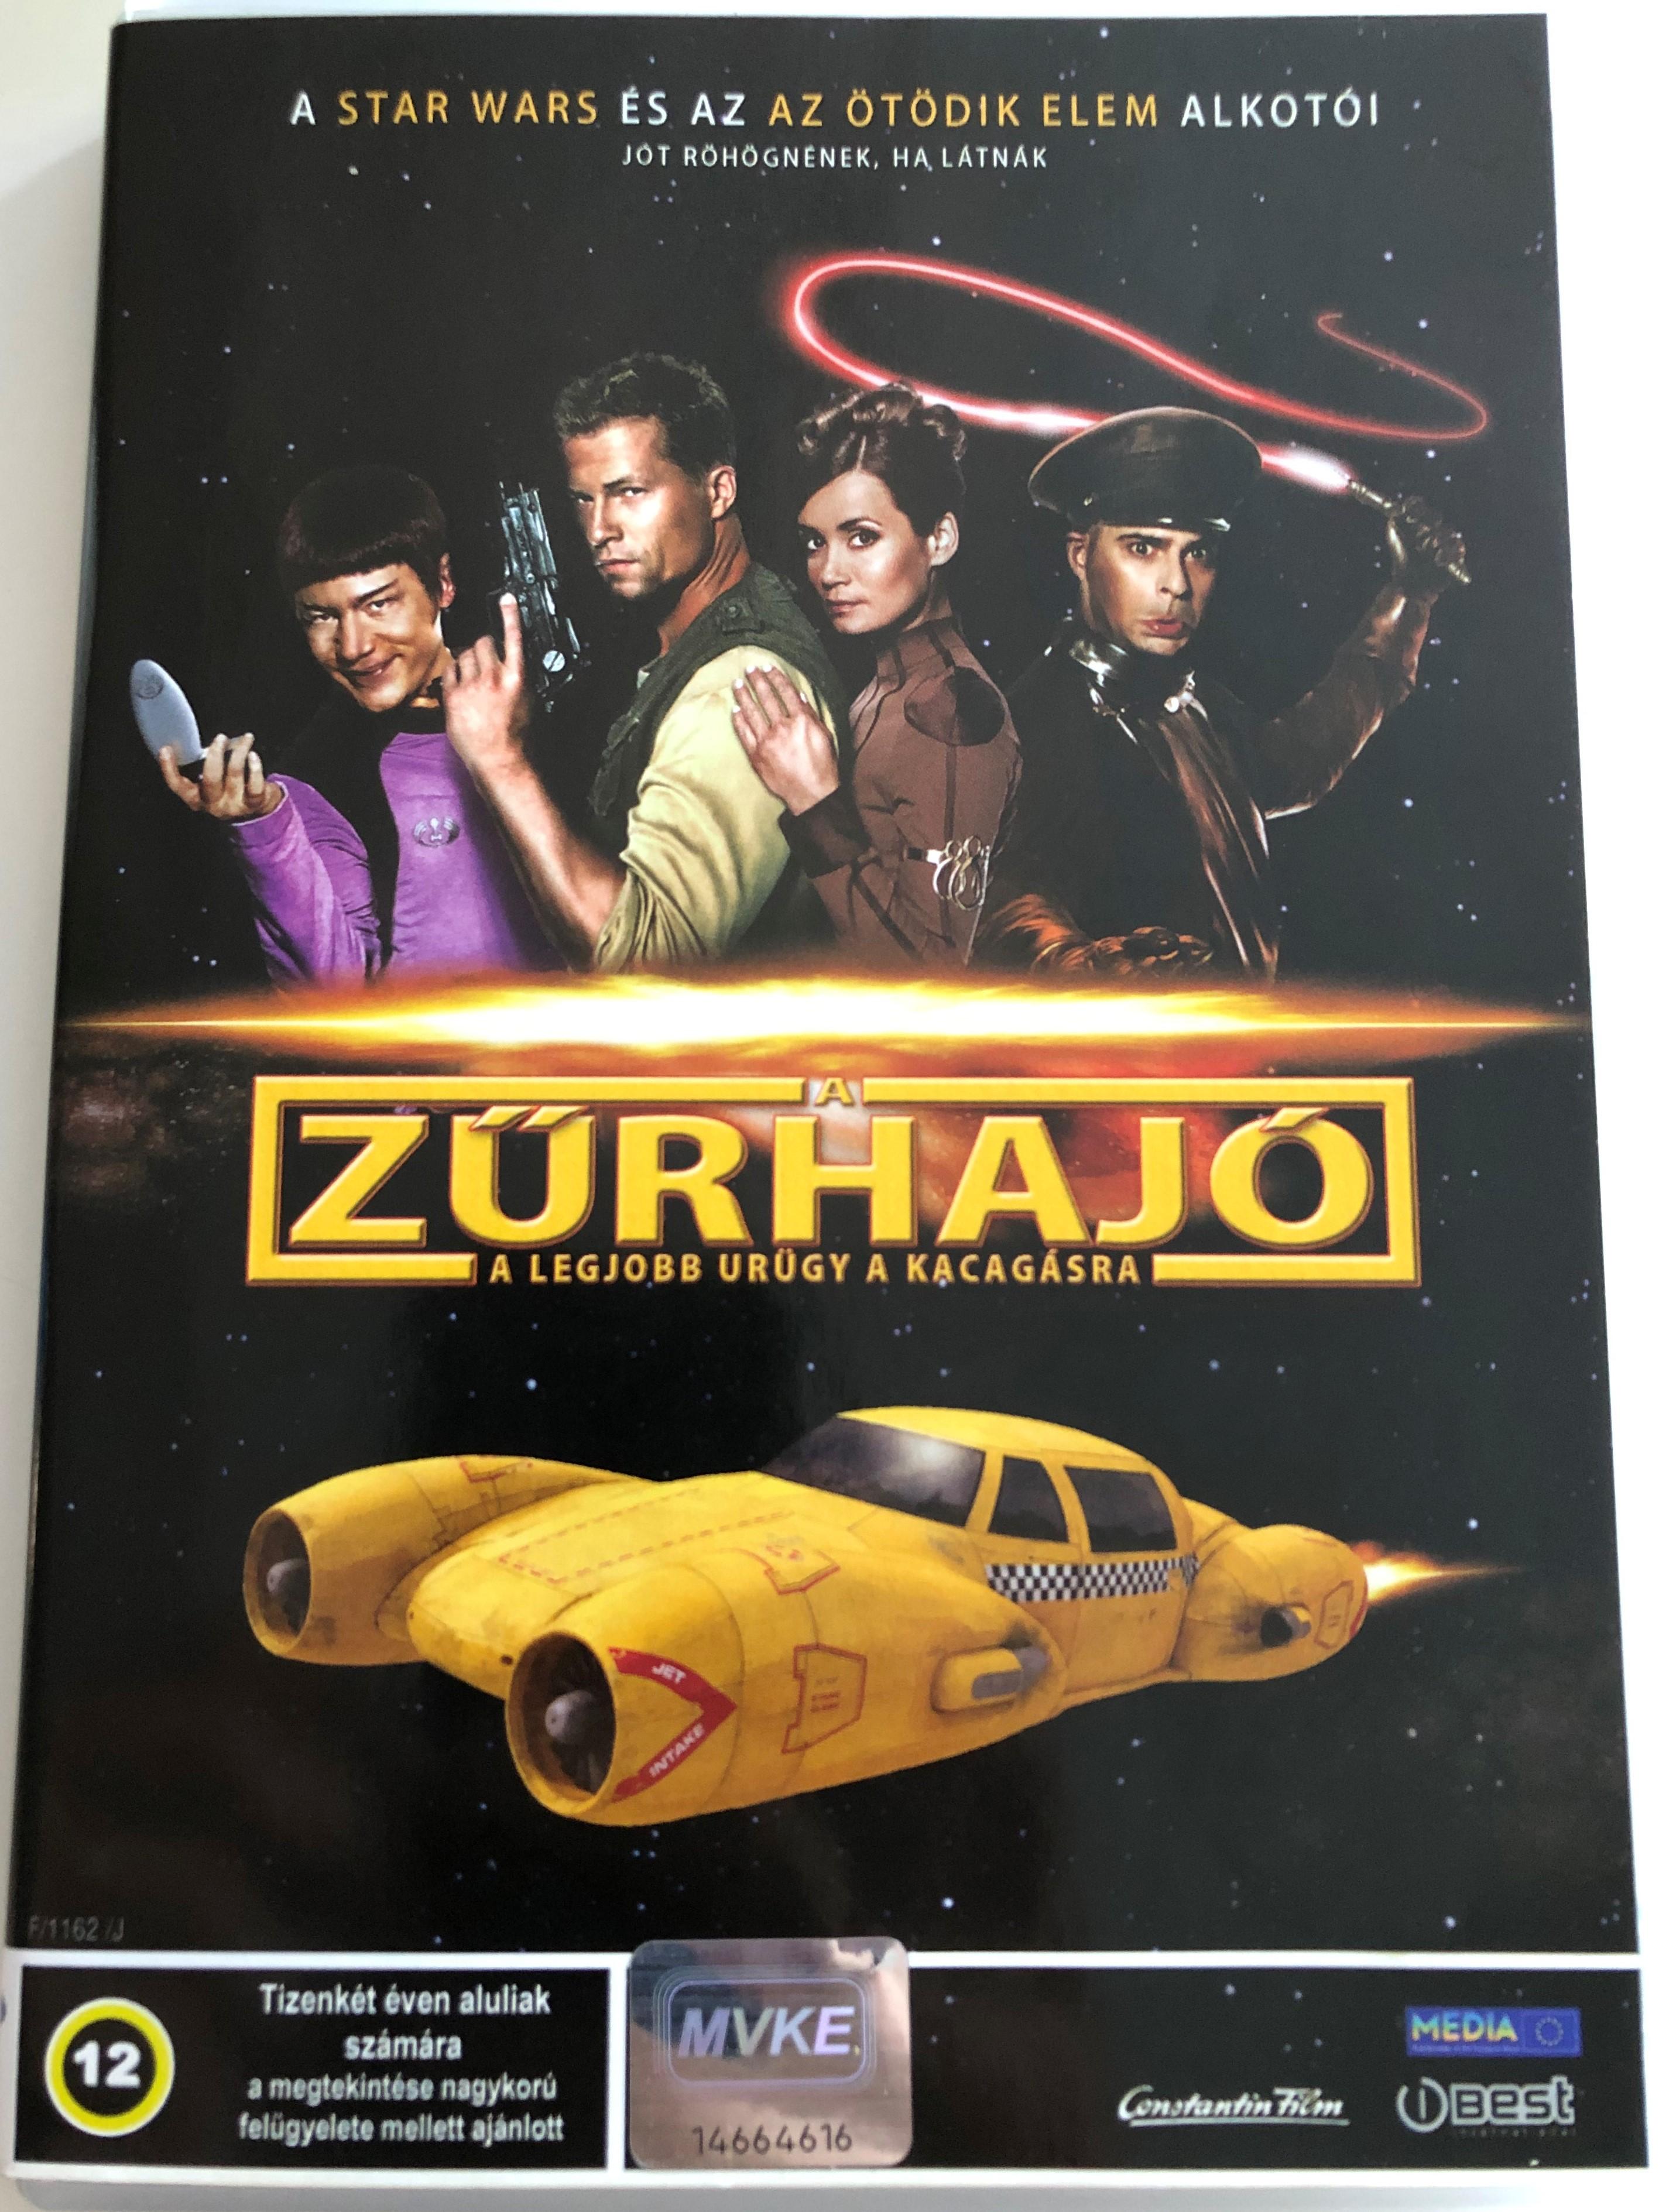 -t-raumschiff-surprise-periode-1-dvd-2004-a-z-rhaj-directed-by-michael-herbig-starring-michael-herbig-rick-kavanian-christian-tramitz-anja-kling-1-.jpg